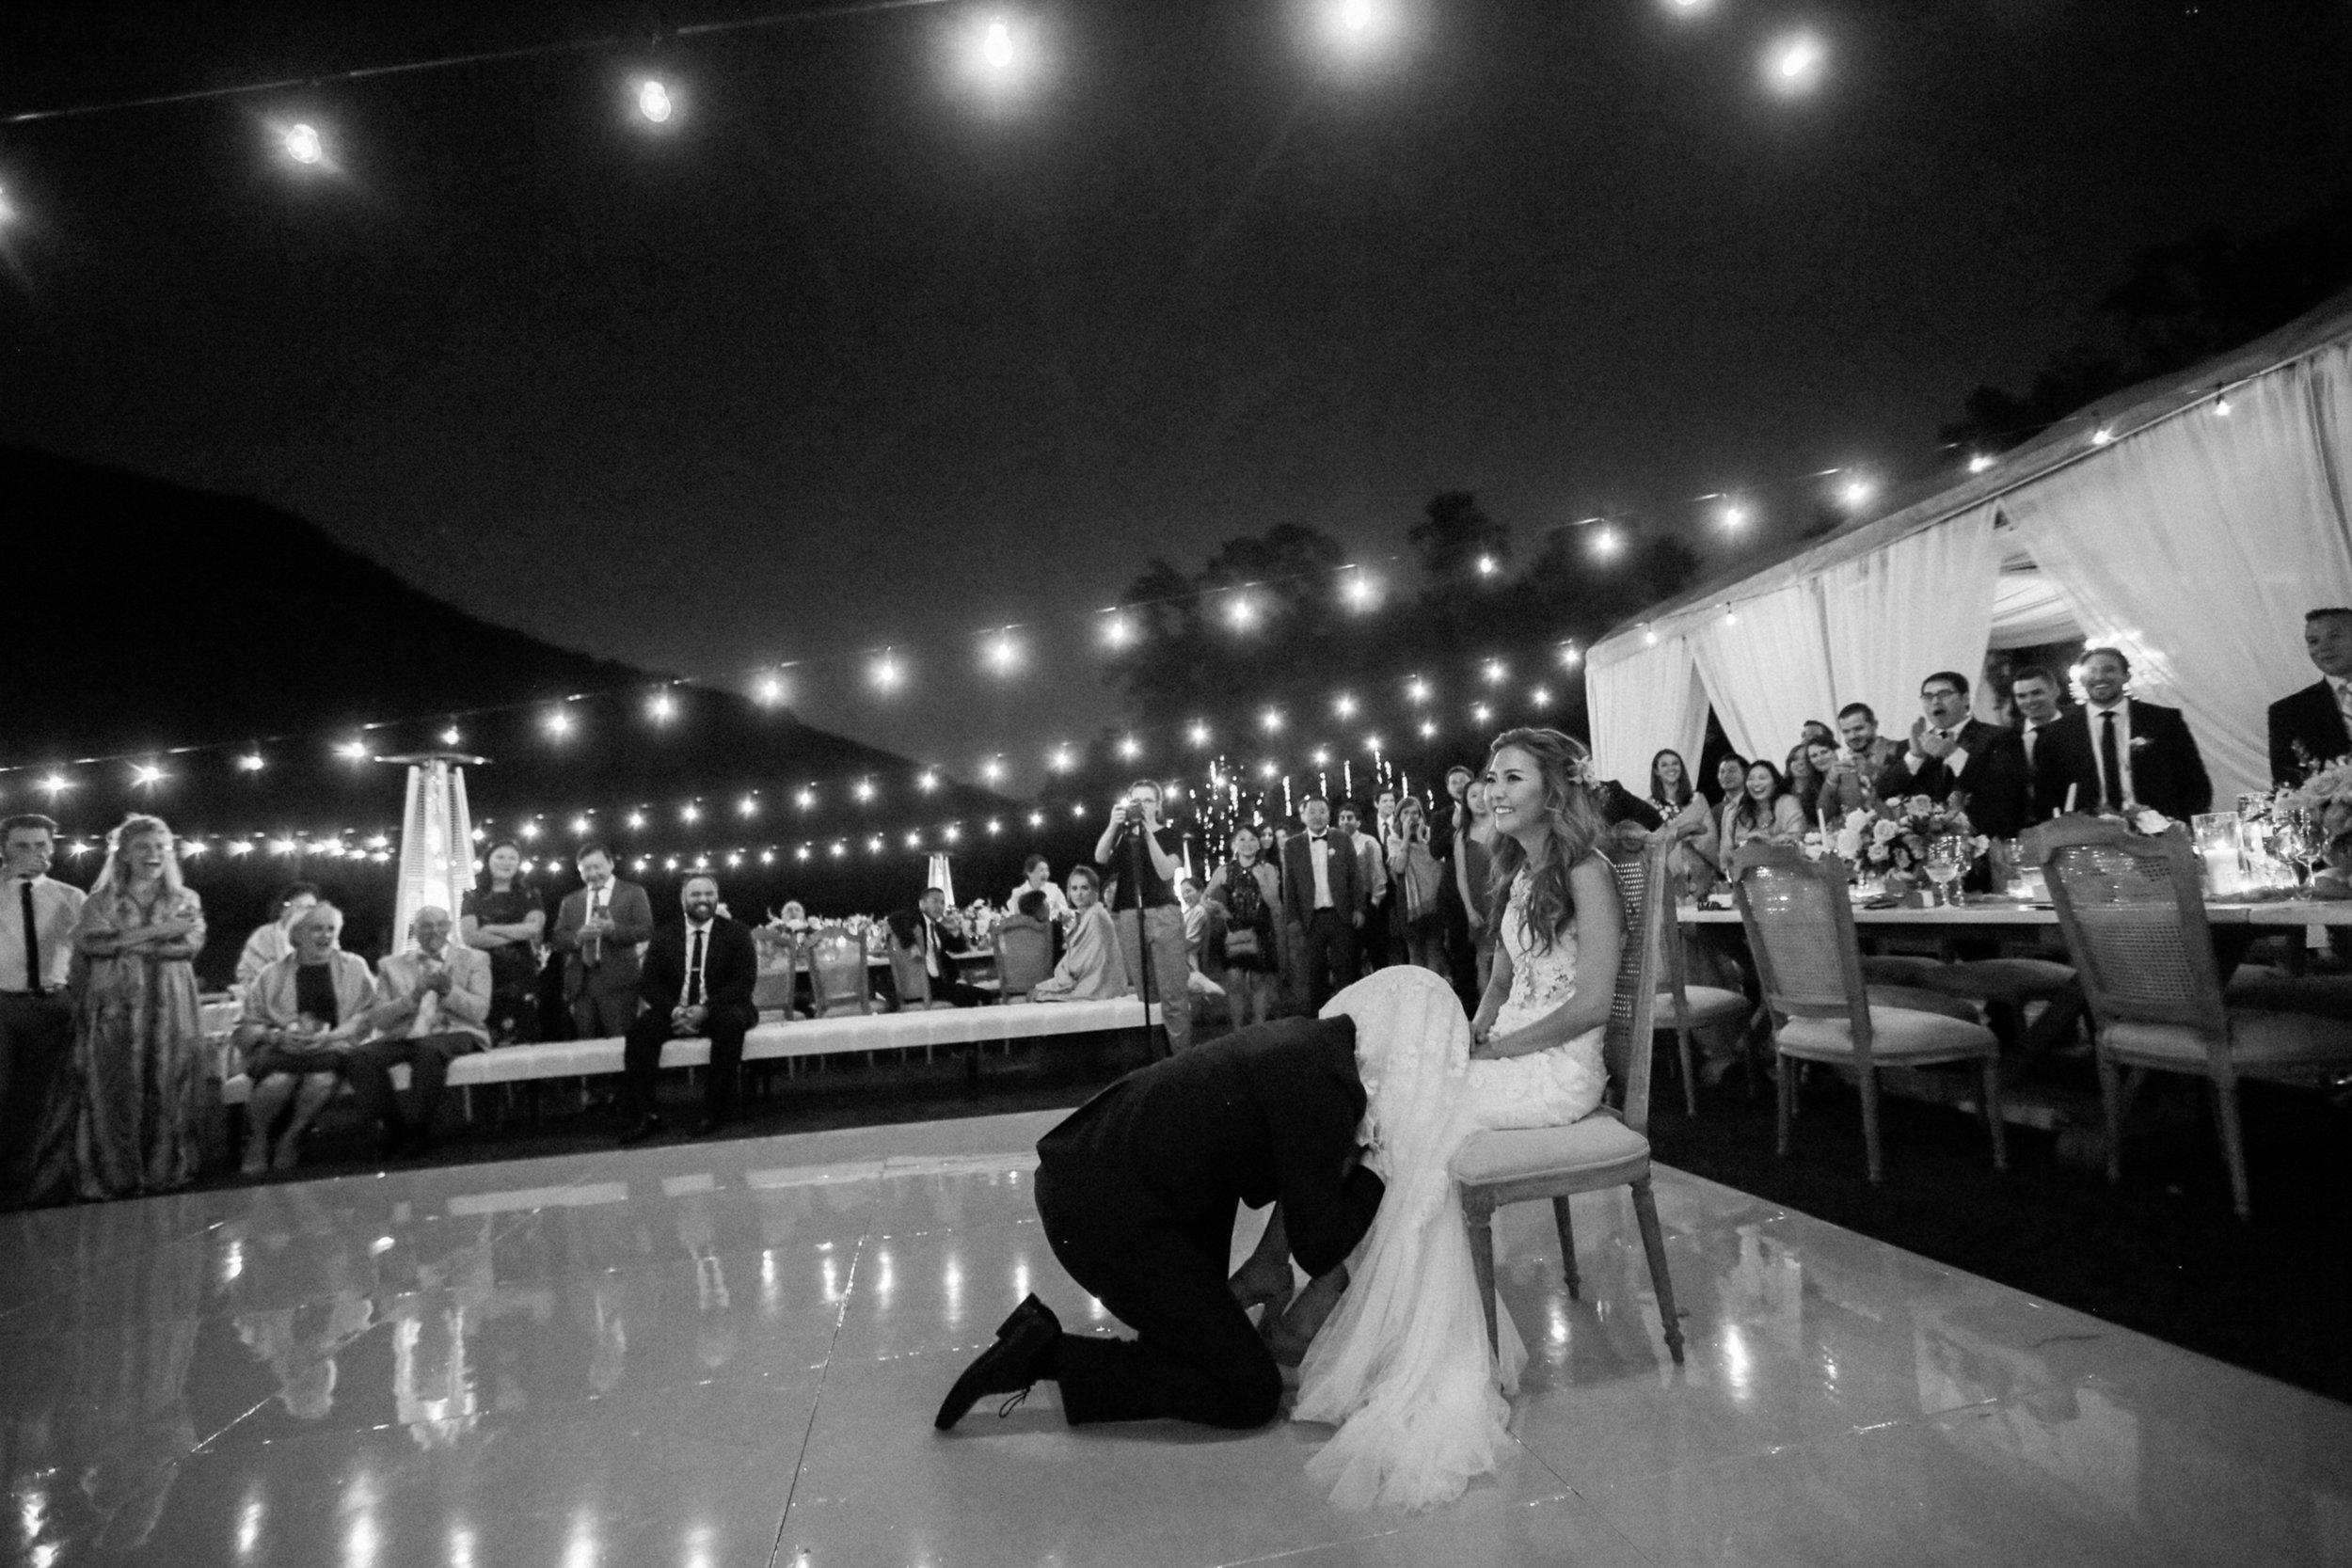 Triunfo_Creek_Winery_Wedding-296-Jen-Huang-JL_Jen_Huang_KB_(314).jpg